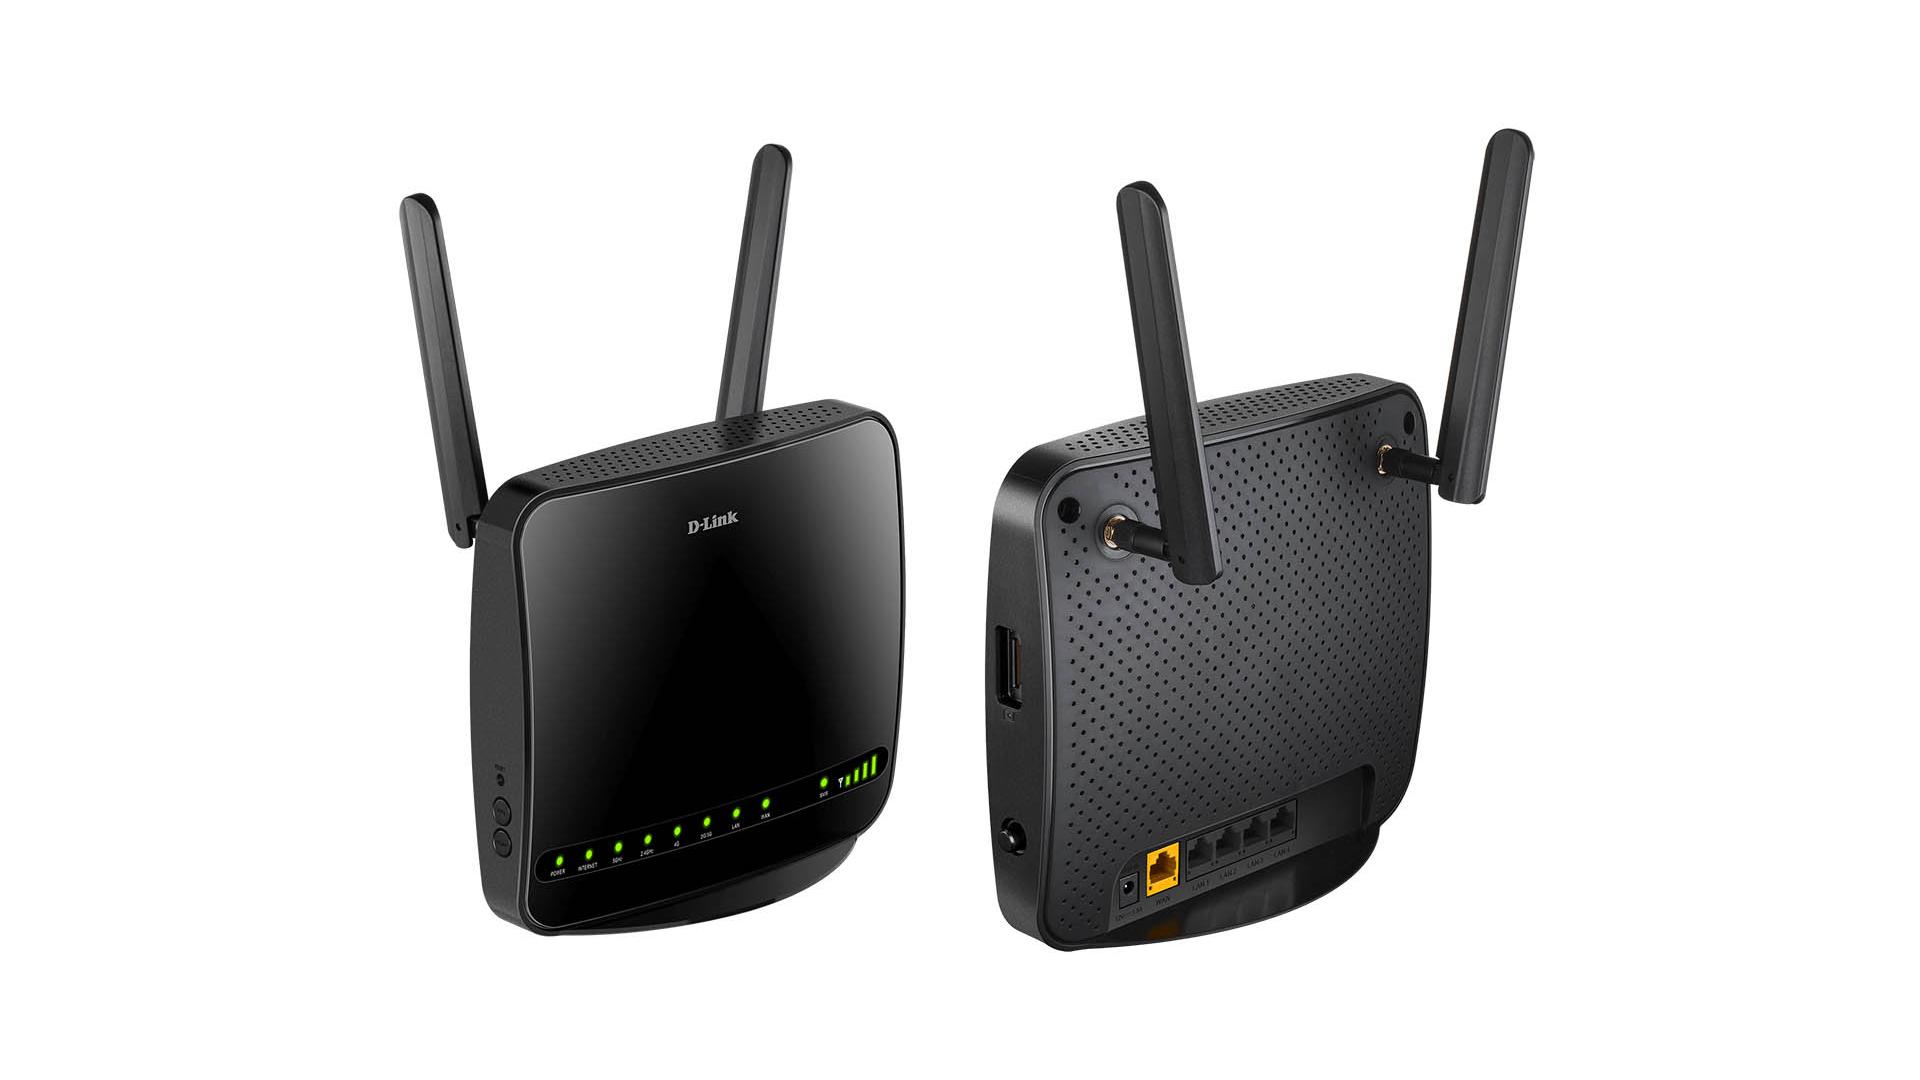 D-Link DWR-953 4G LTE Router review | TechRadar